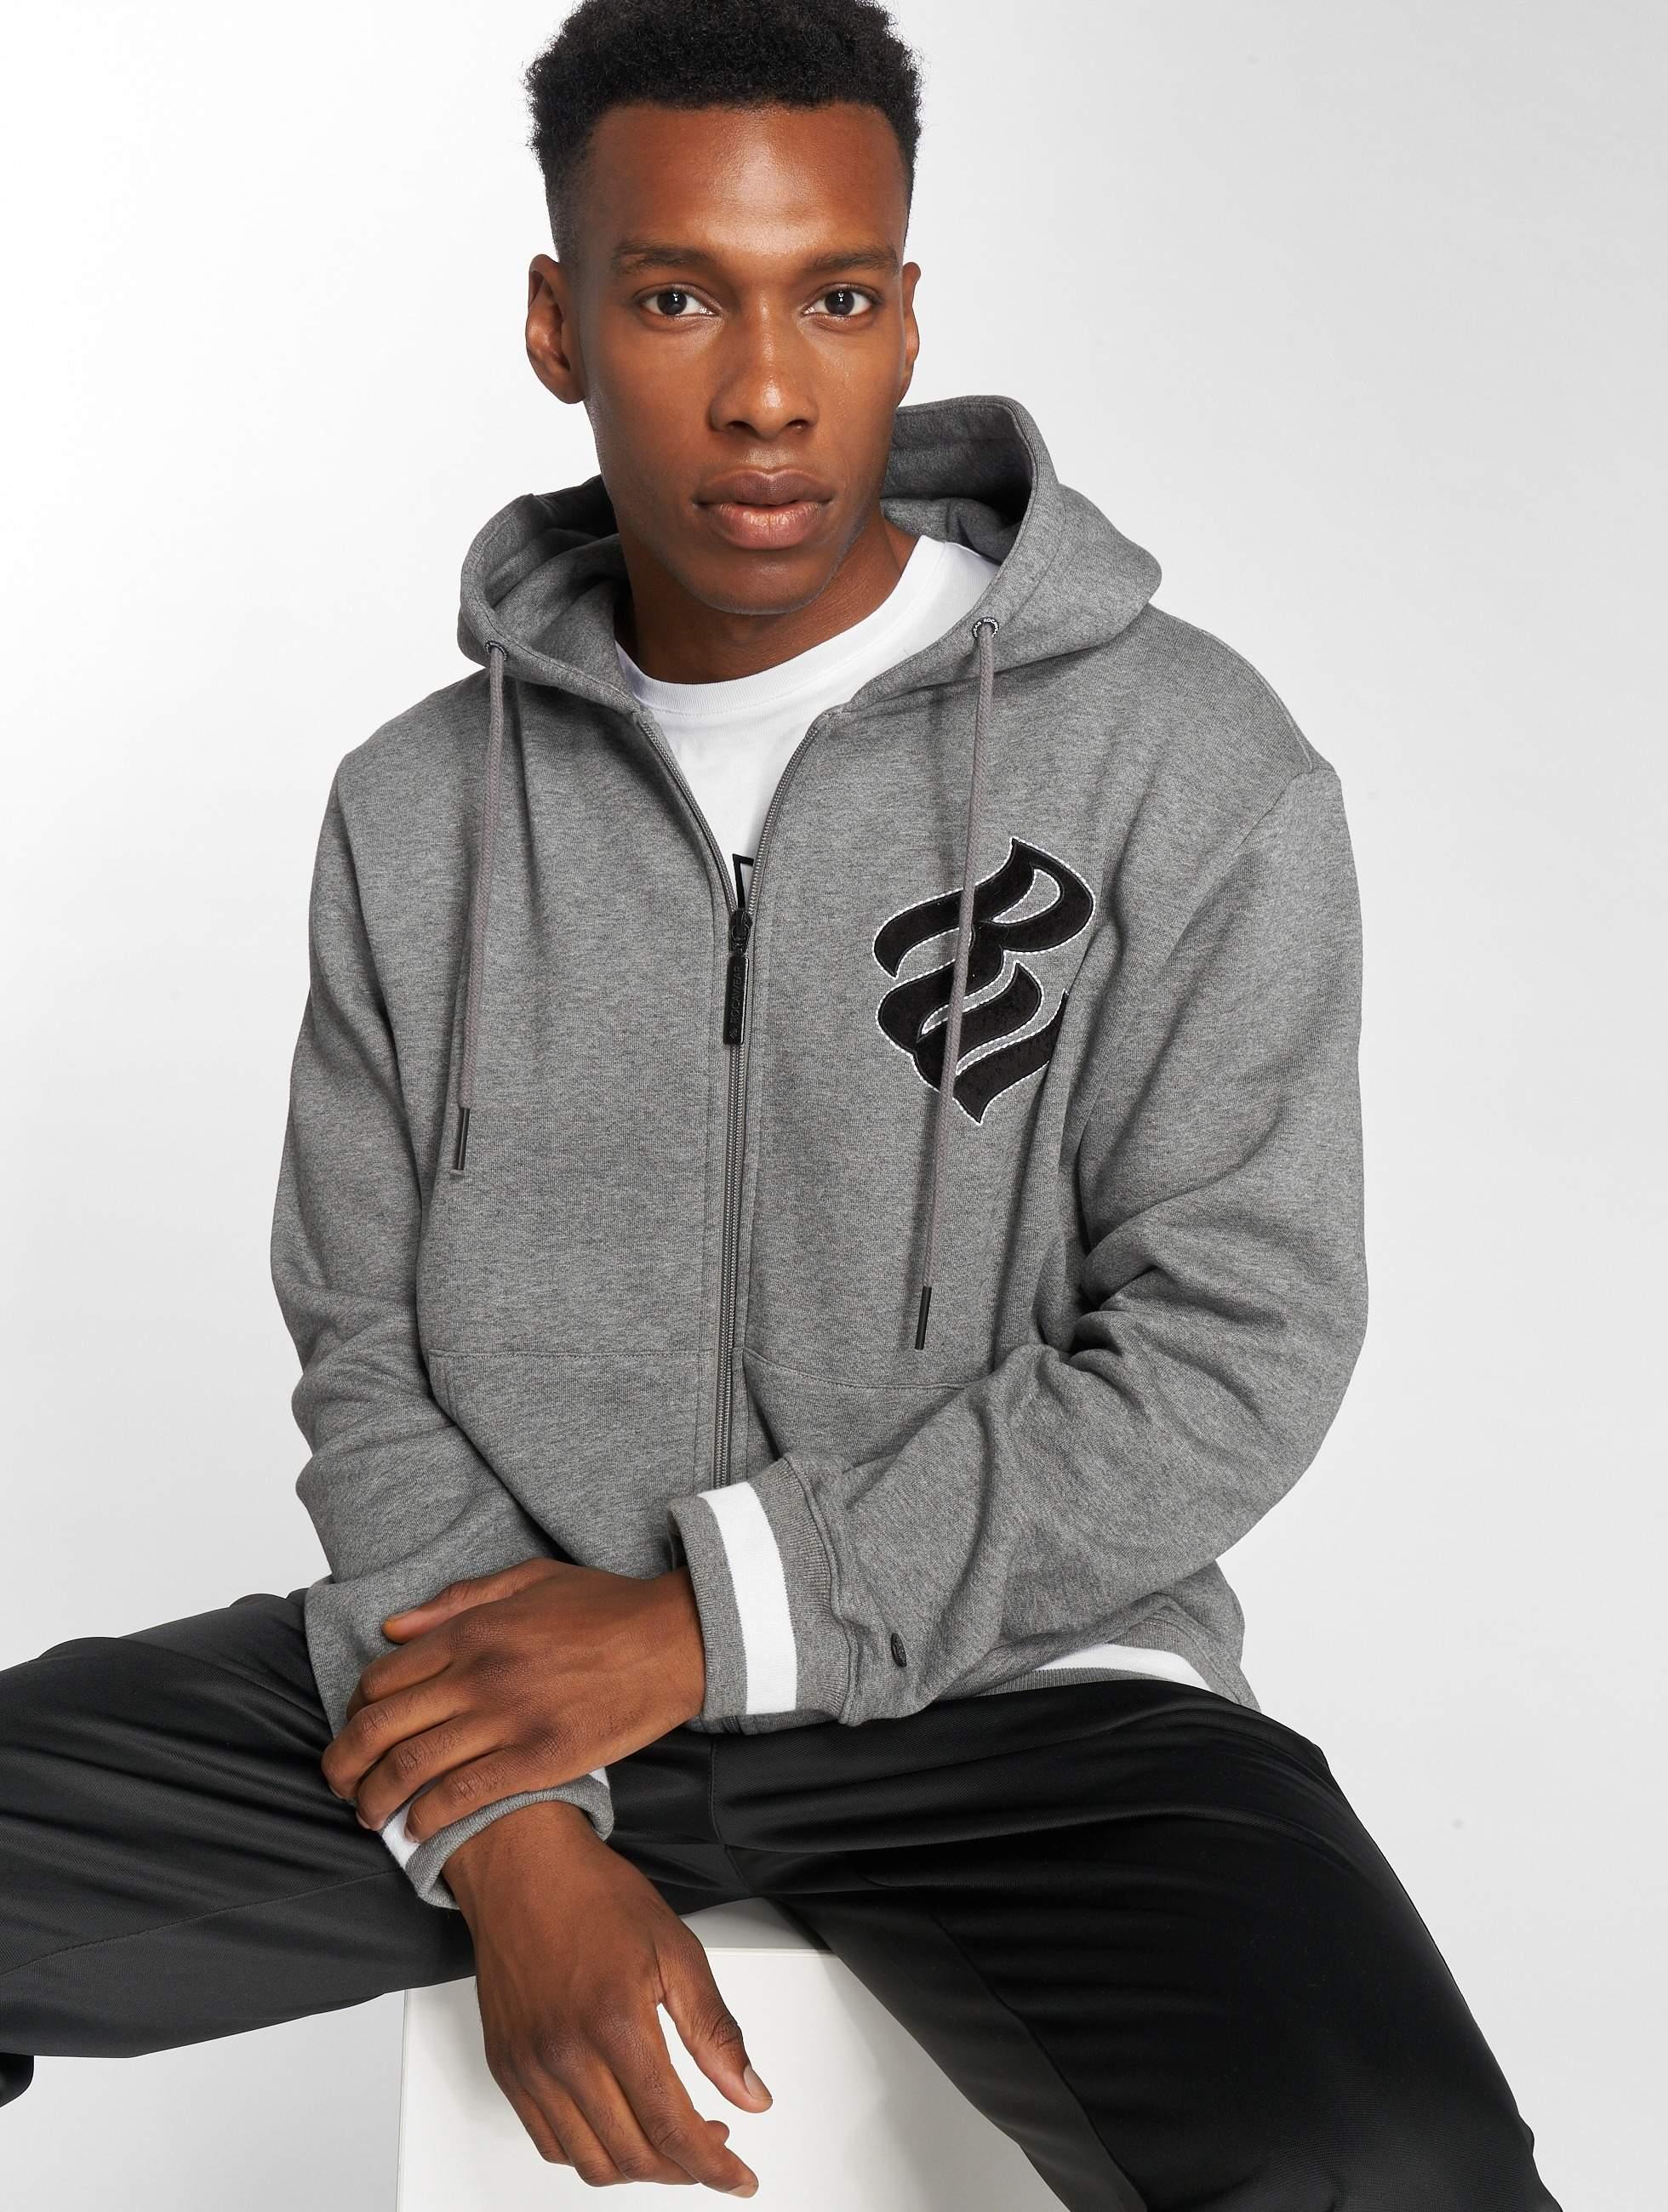 Rocawear / Zip Hoodie Logo in grey S